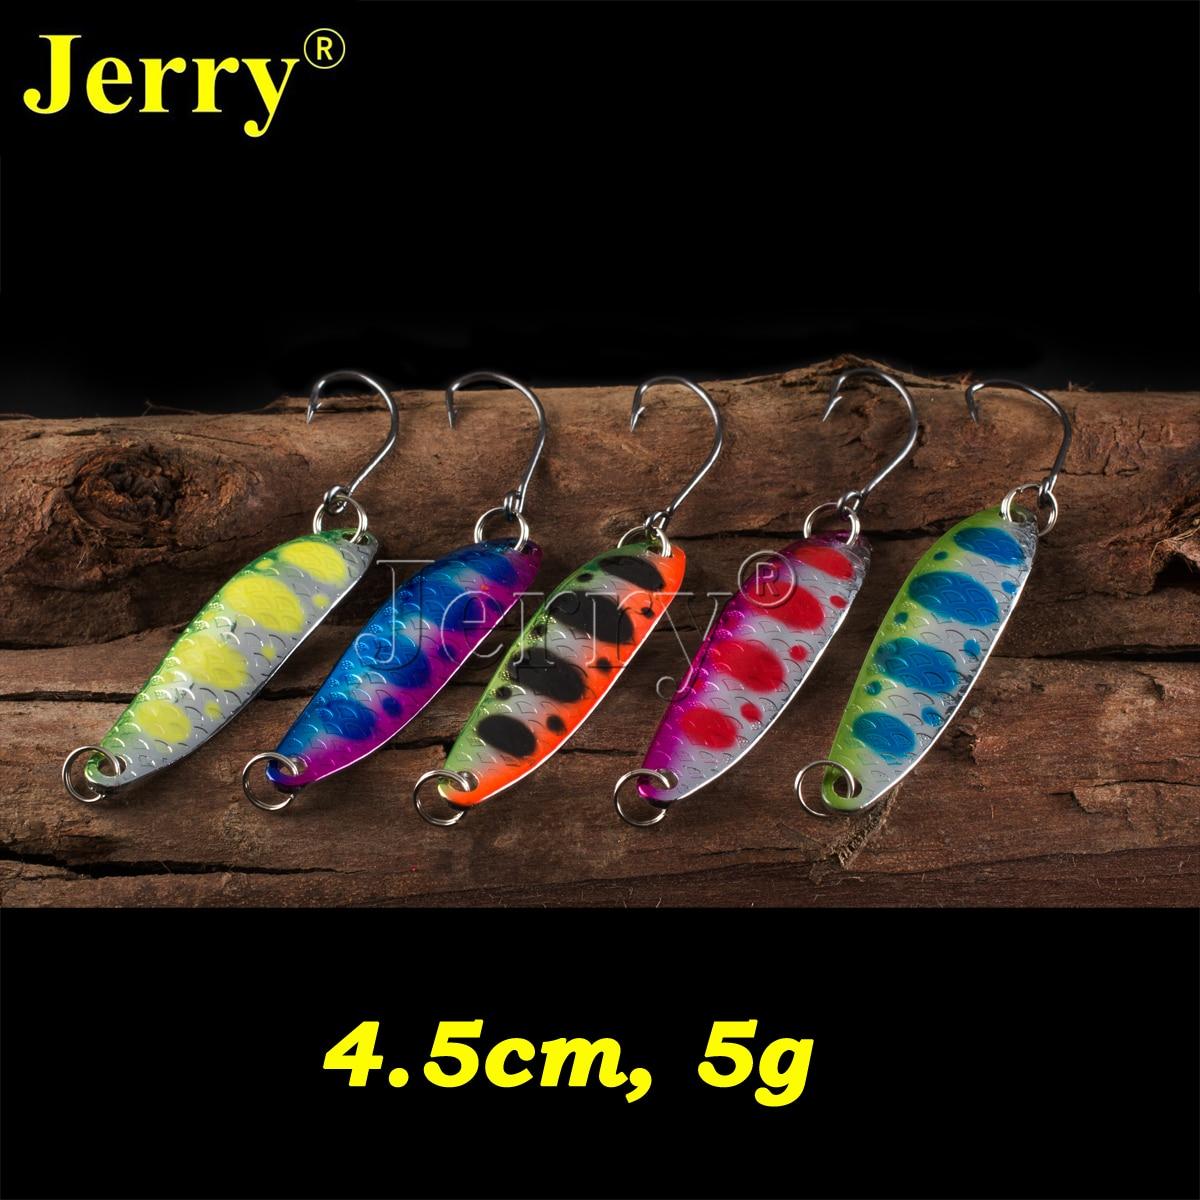 Jerry 5st 5g Casting fladder metall skedar vintern lockar artificiell bete